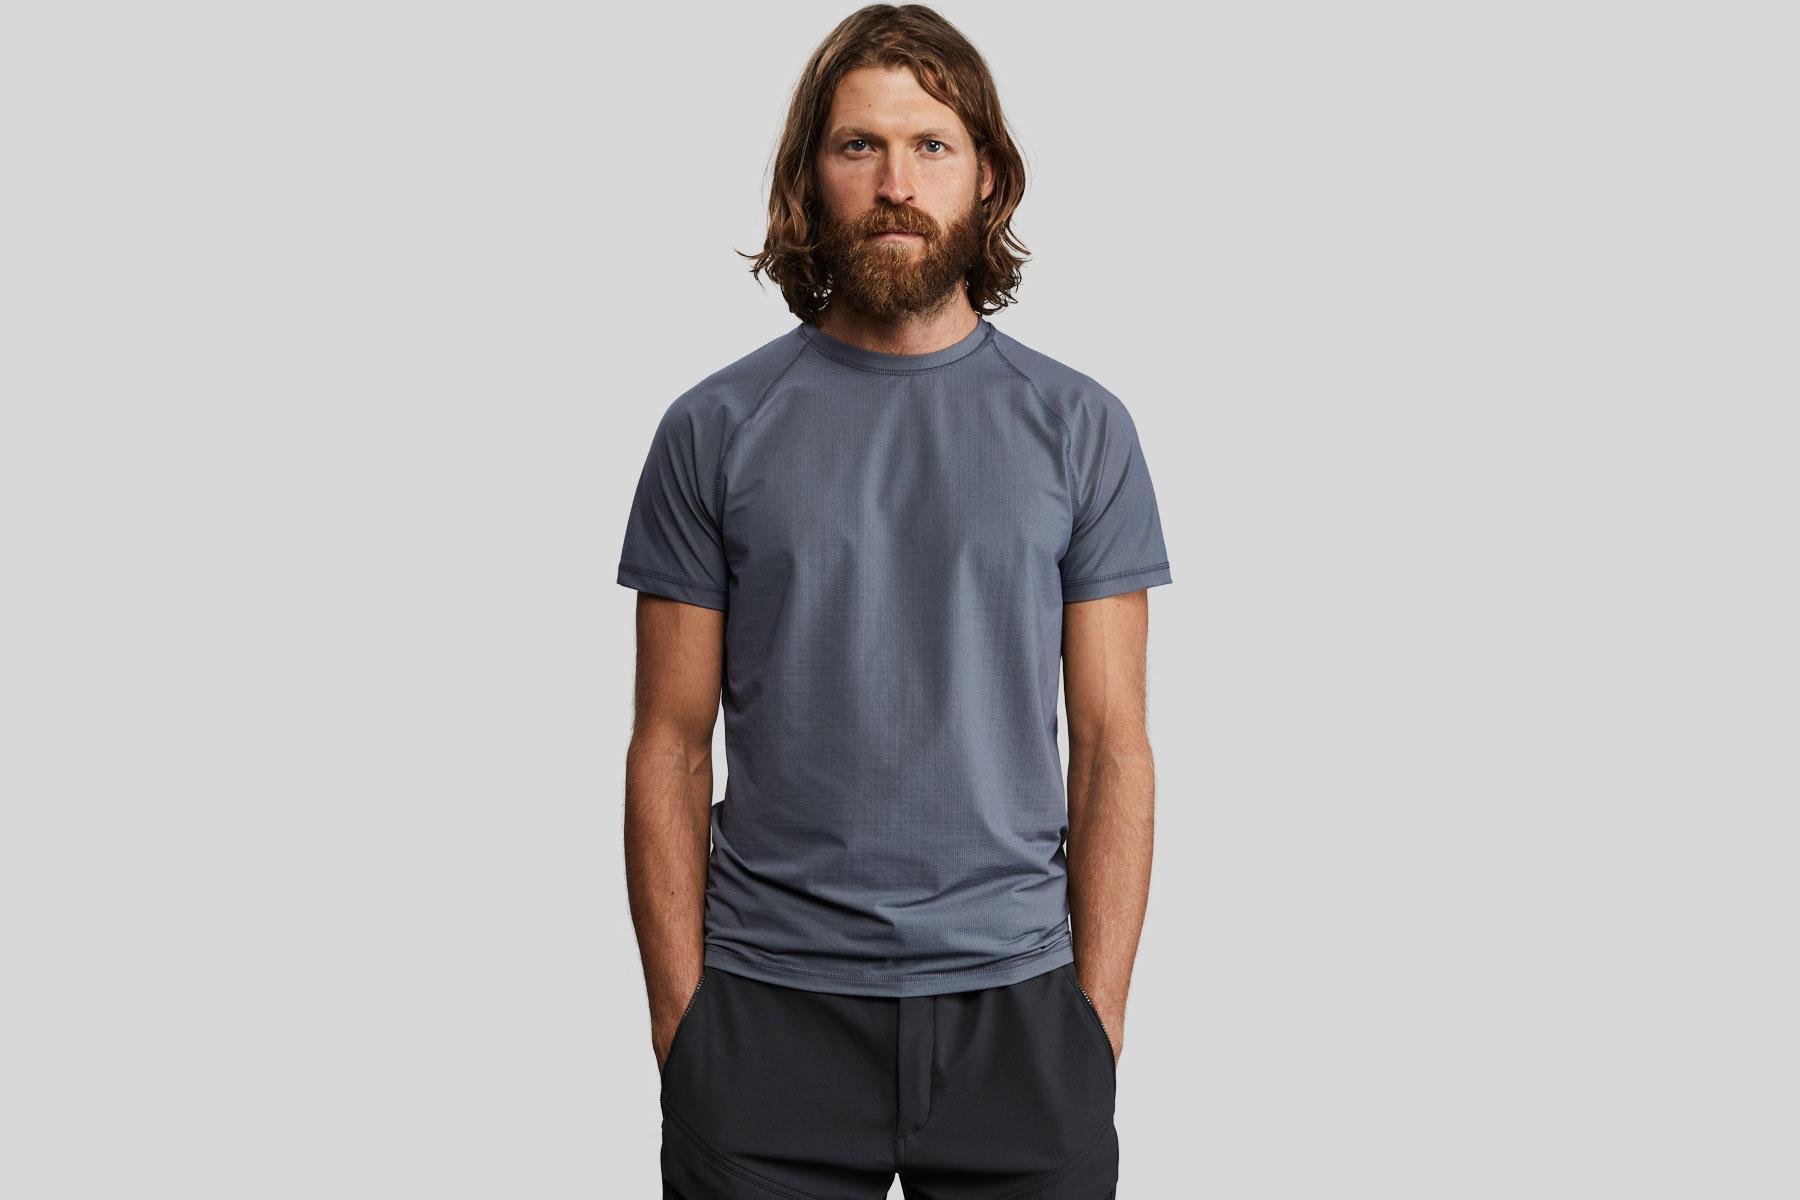 Carbon Fiber T-Shirt: Vollebak Unveils Top to 'Save Your Skin'